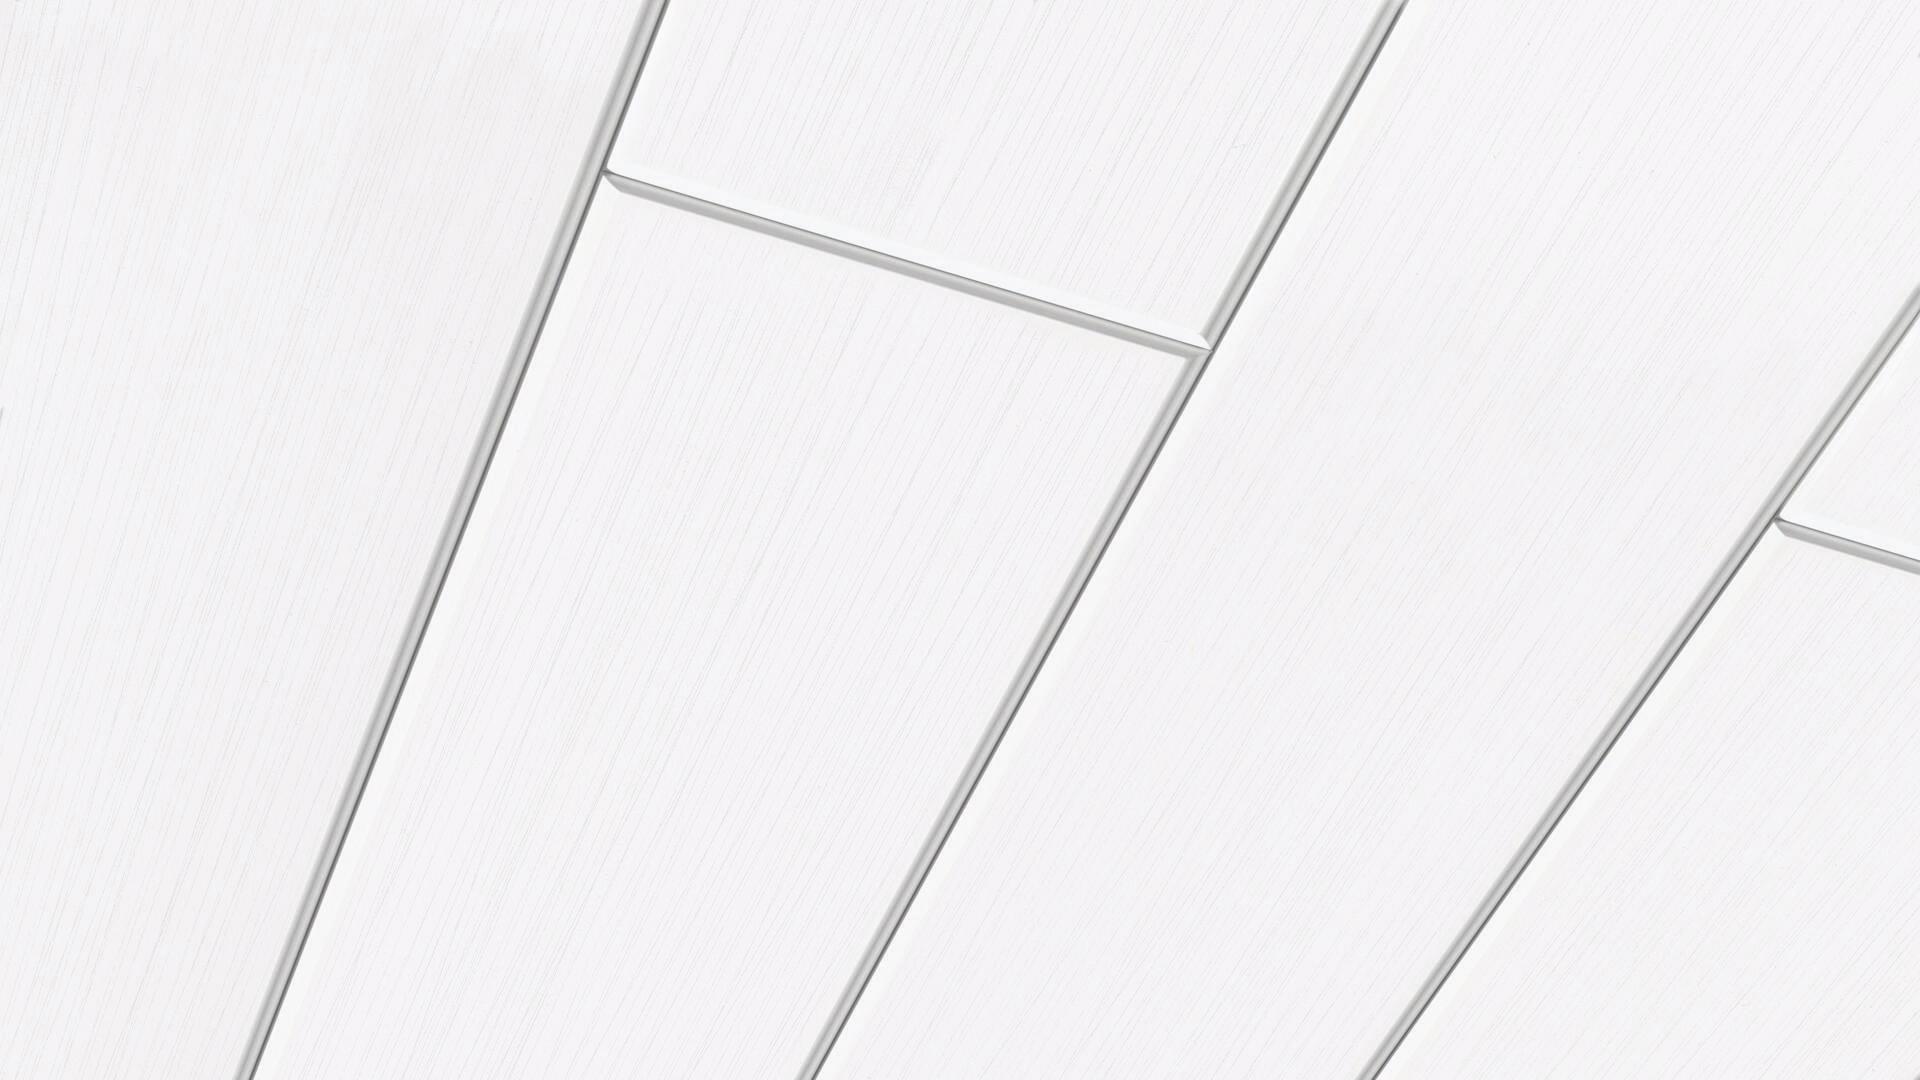 Paneles decorativos Bocado 200 Línea blanca 4074